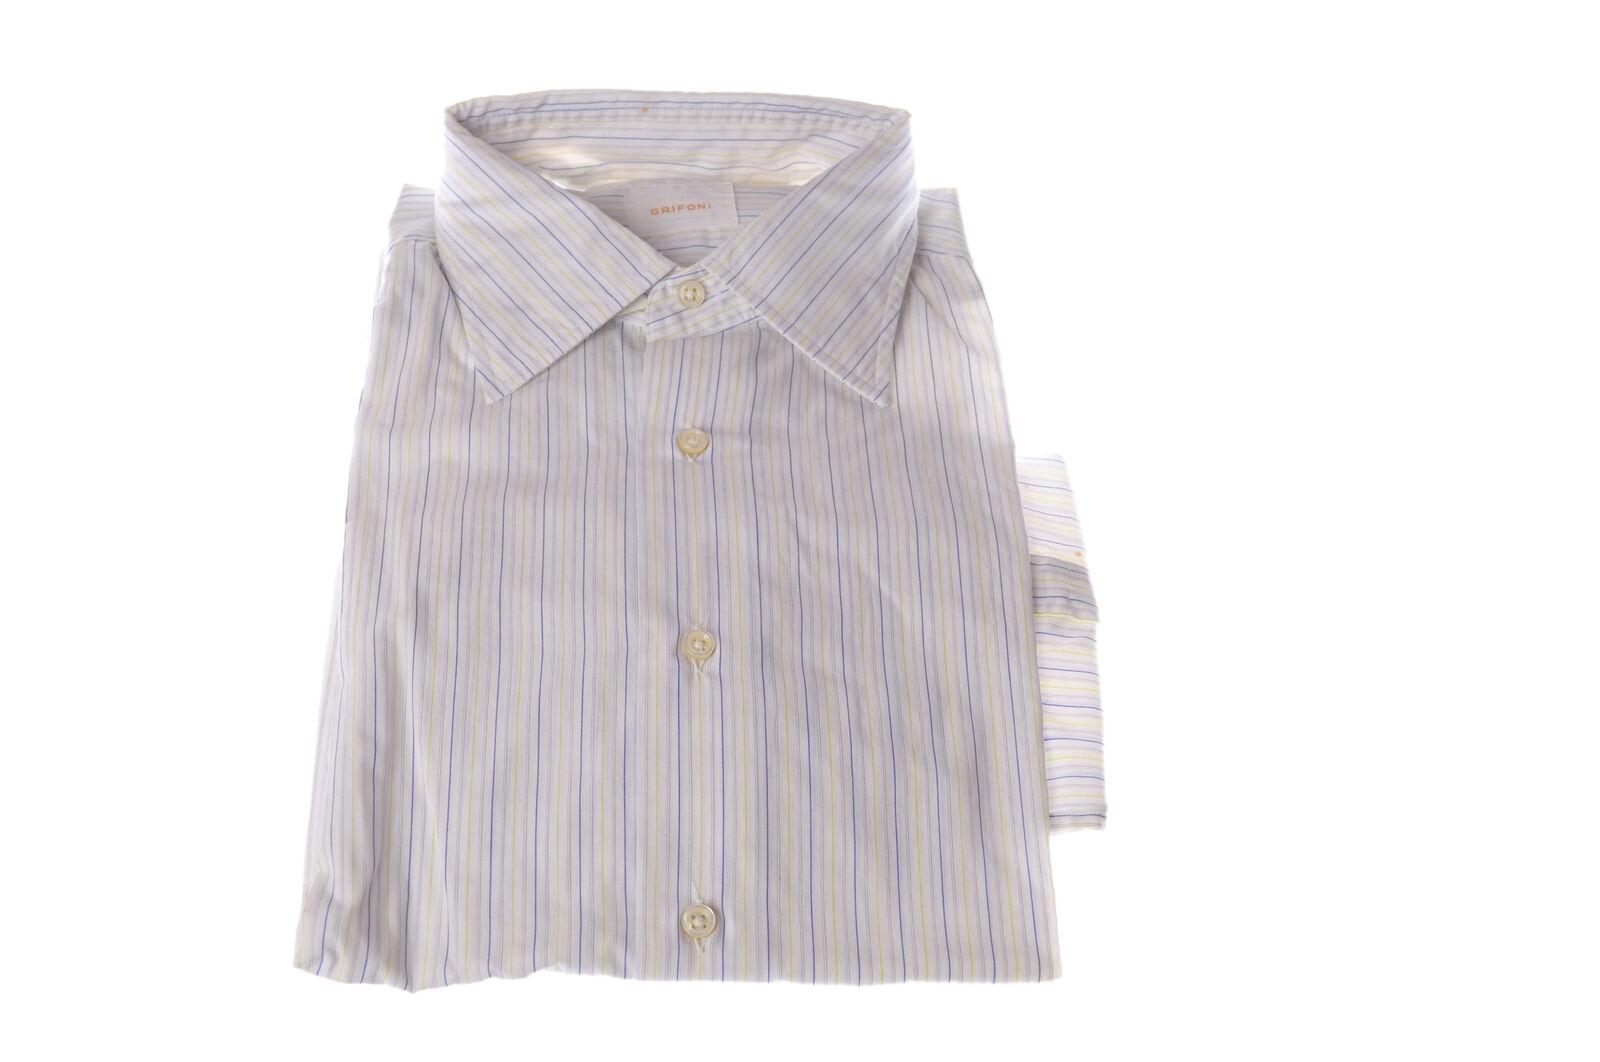 Mauro grifoni  -  Shirt - Male - White - 2986304A183910